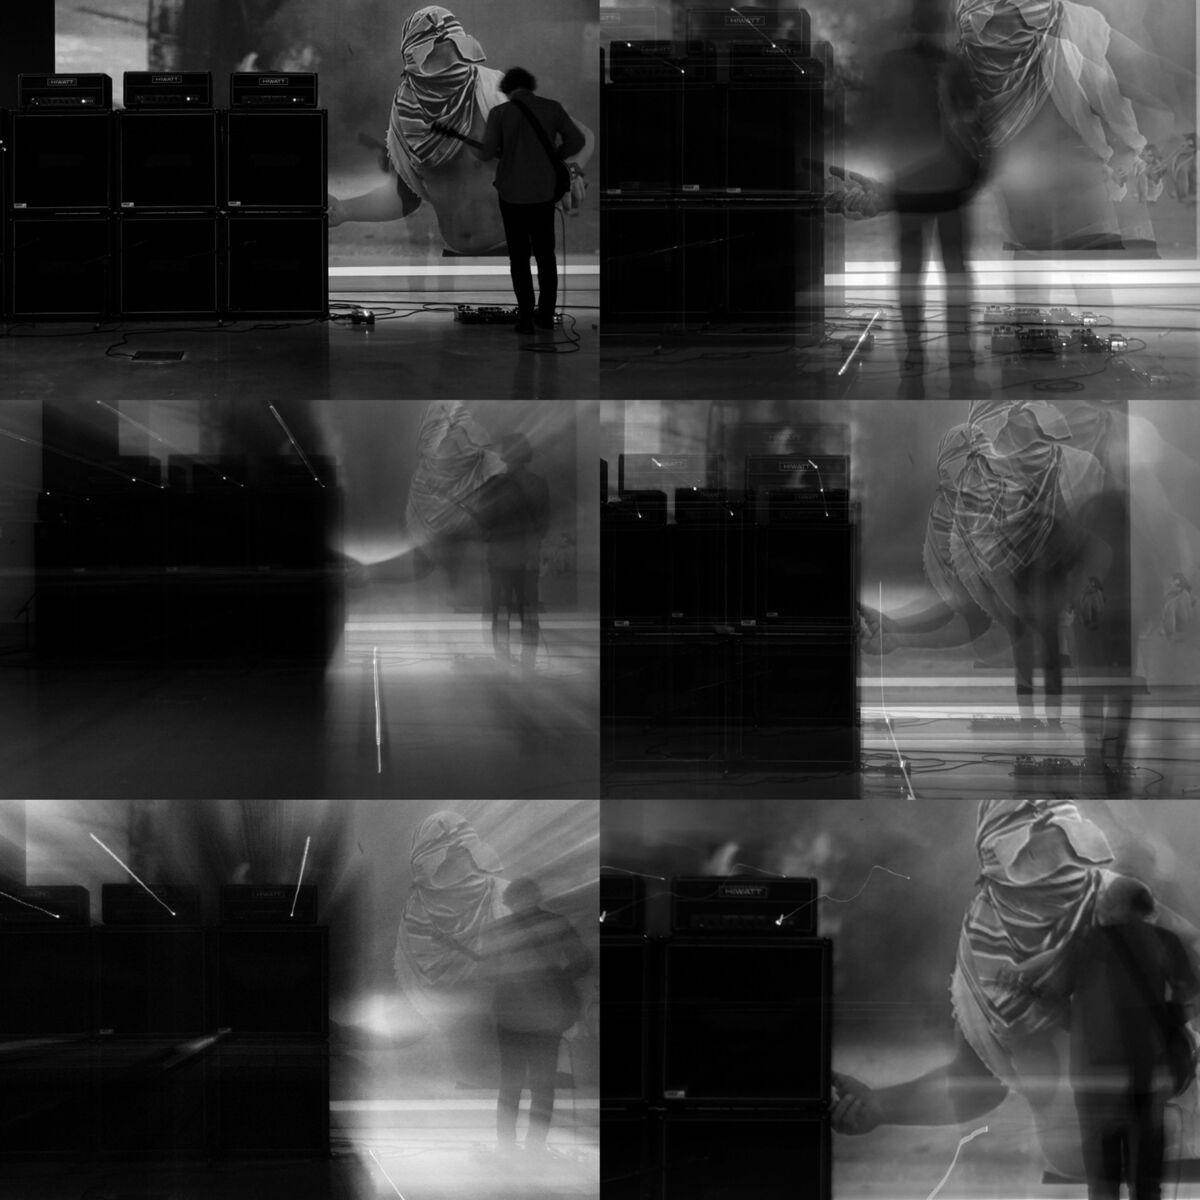 Marco Fusinato, performance view of SPECTRAL ARROWS: Melbourne at Buxton Contemporary, Melbourne, 2018. © Marco Fusinato. Photo by Renato Colangelo. Courtesy of the artist and Anna Schwartz Gallery.